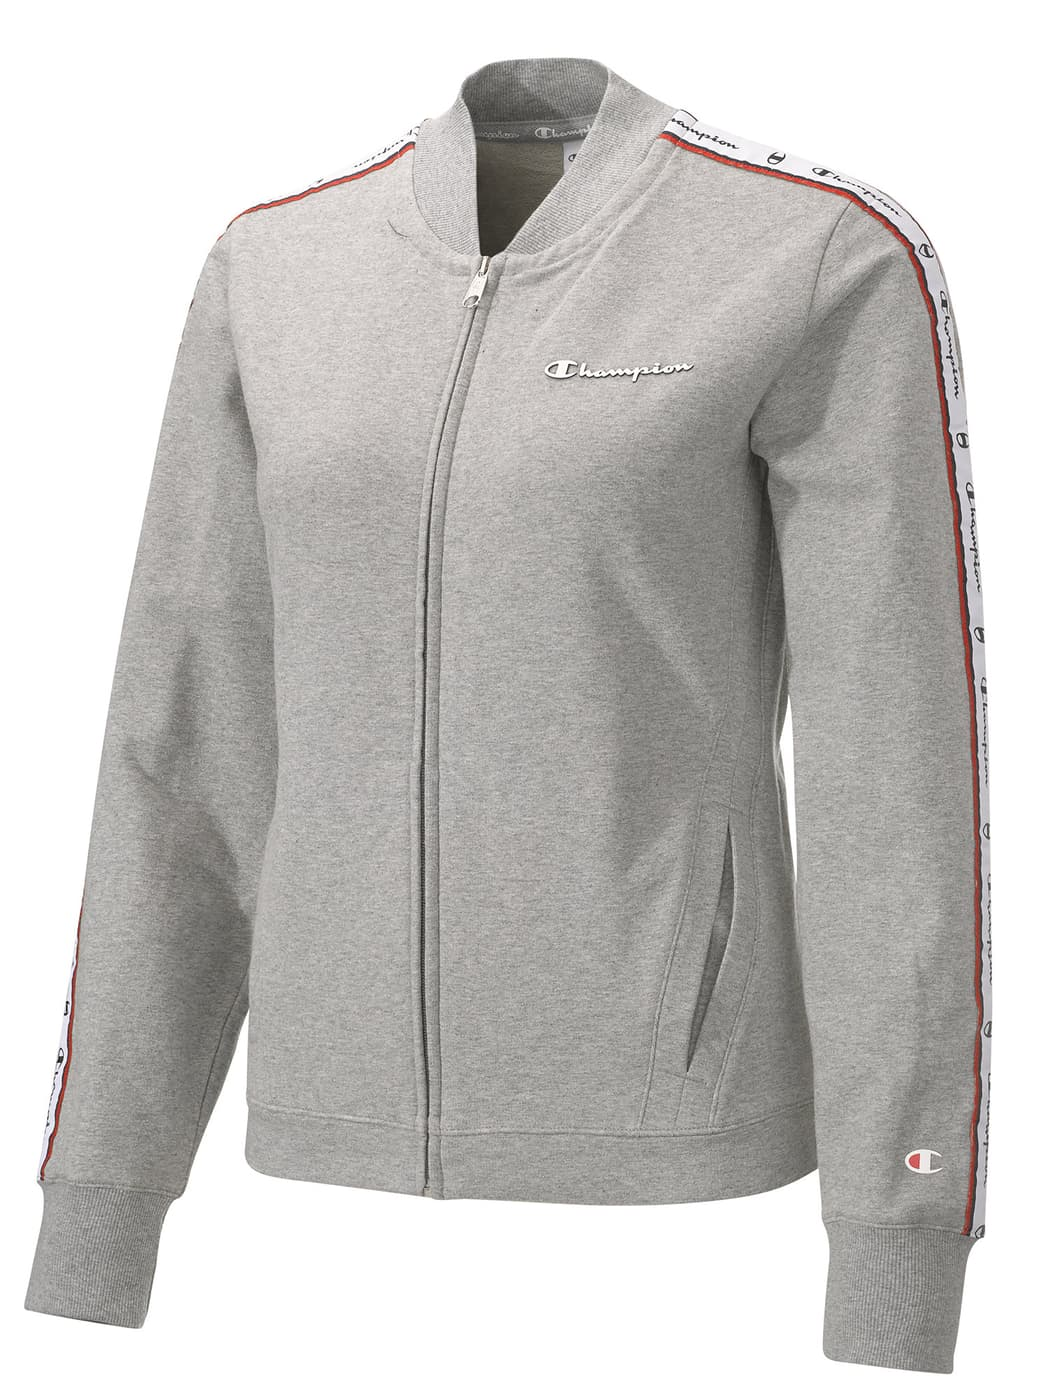 newest 9a190 c5760 Champion Legacy Women Full Zip Sweatshirt Giacca da donna